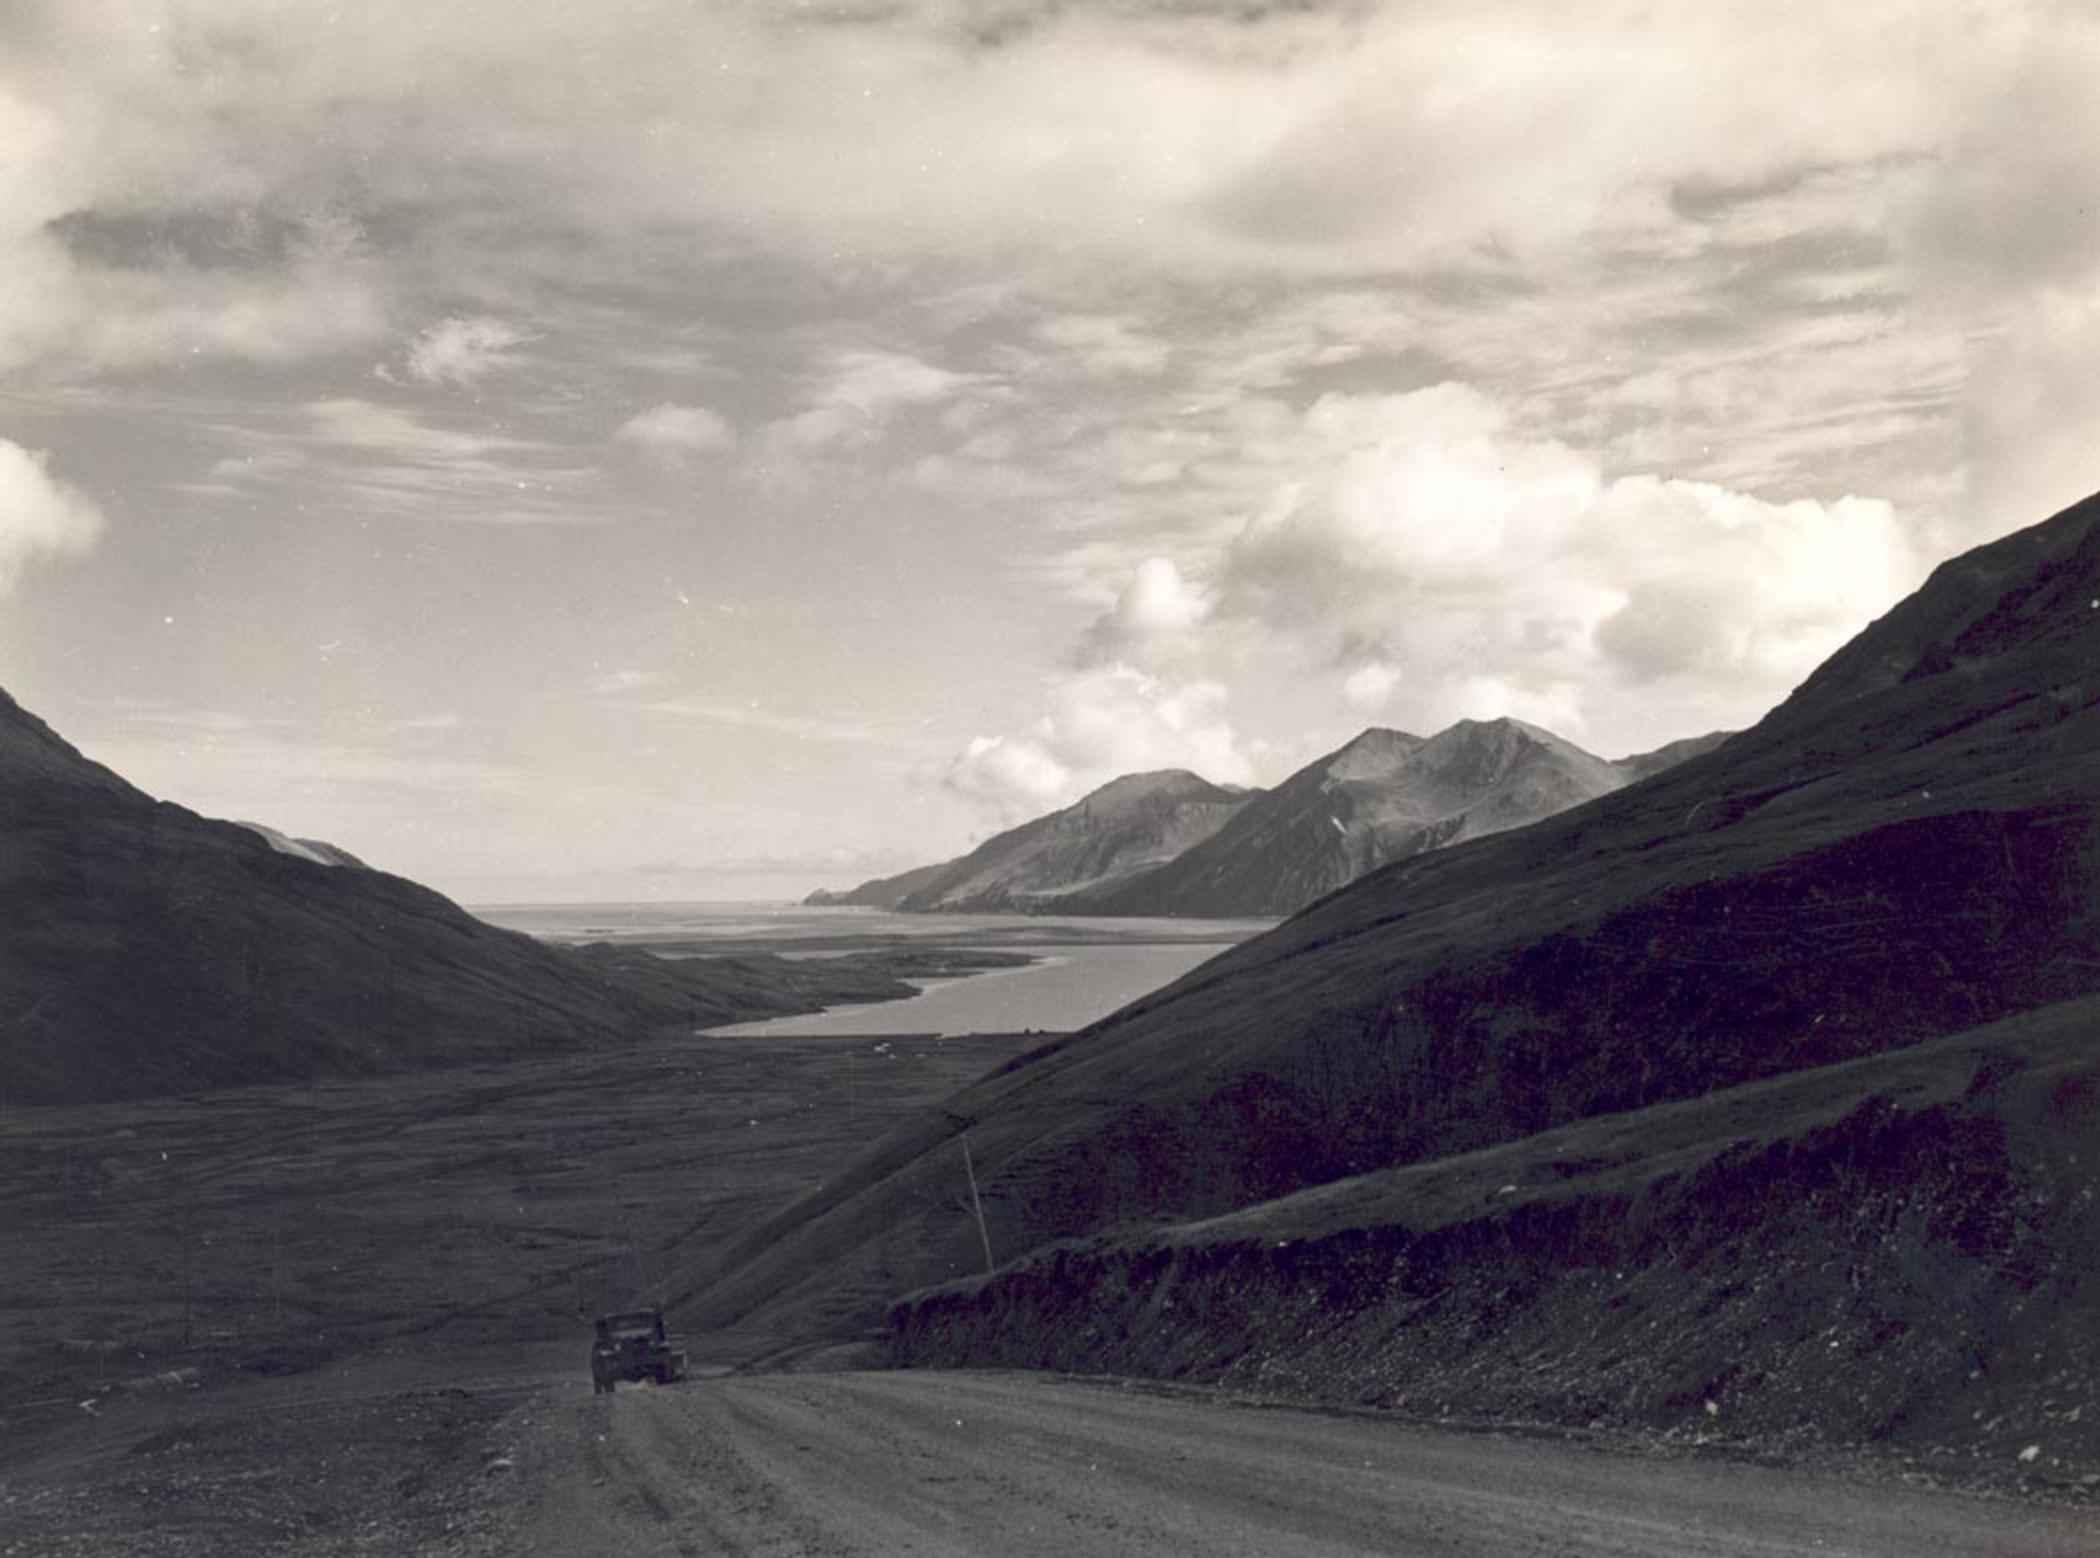 Free Picture Landscape Scenics Vintage Road Photo